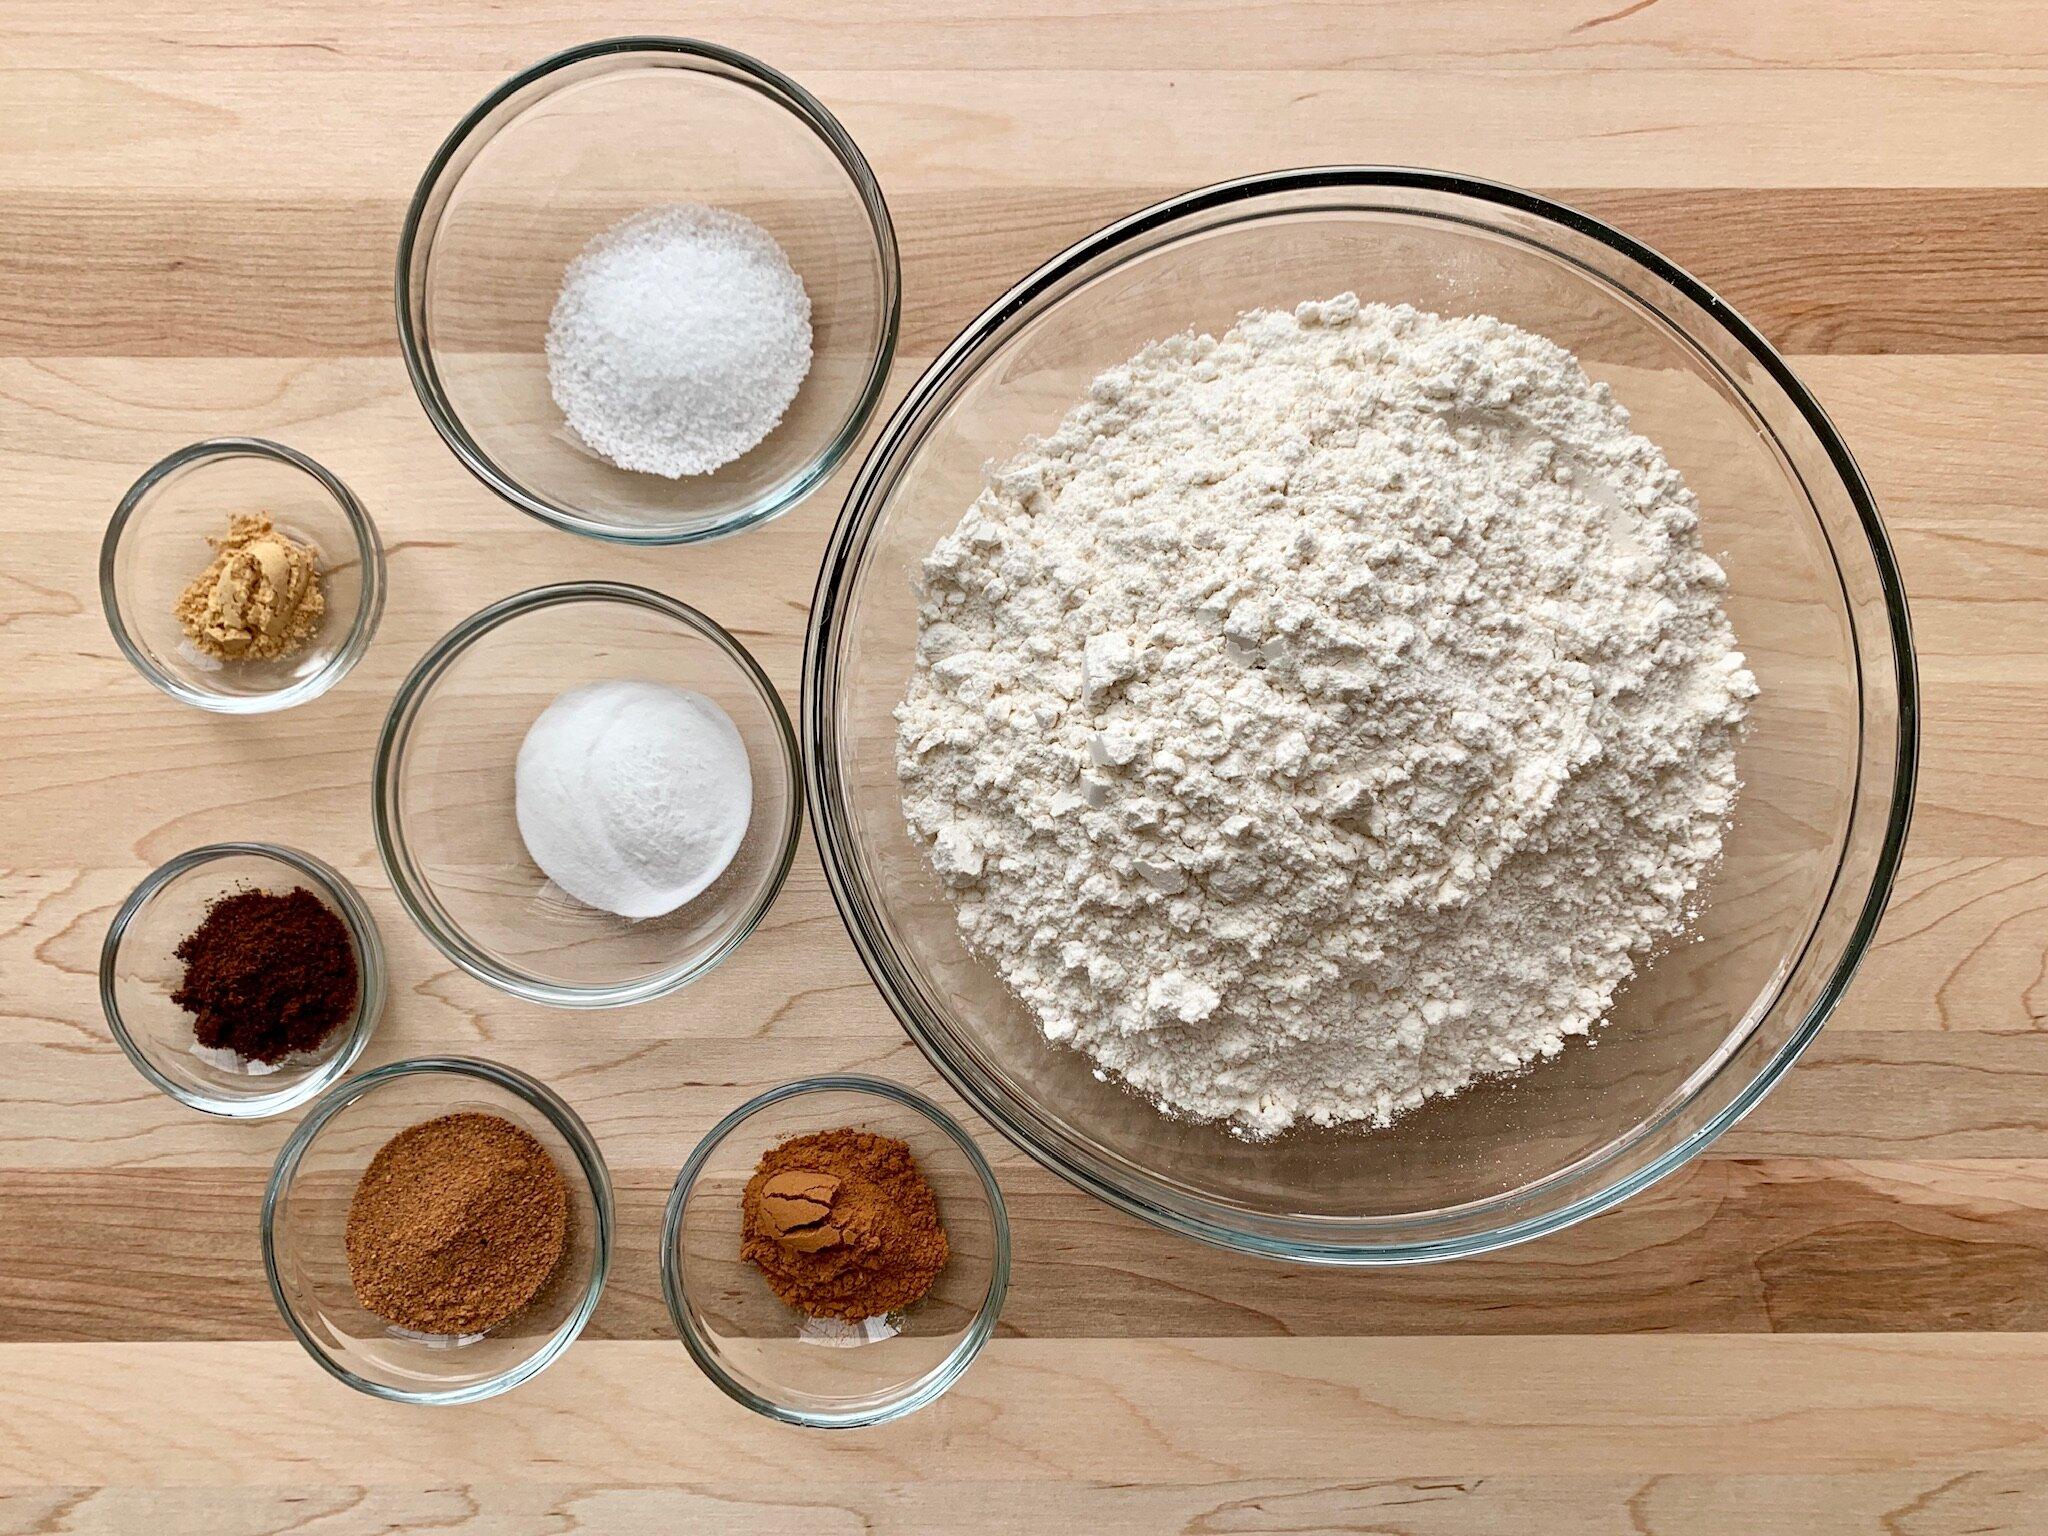 2. In a medium-sized bowl, whisk together flour, baking soda, salt, cinnamon, nutmeg, cloves, and ginger. -